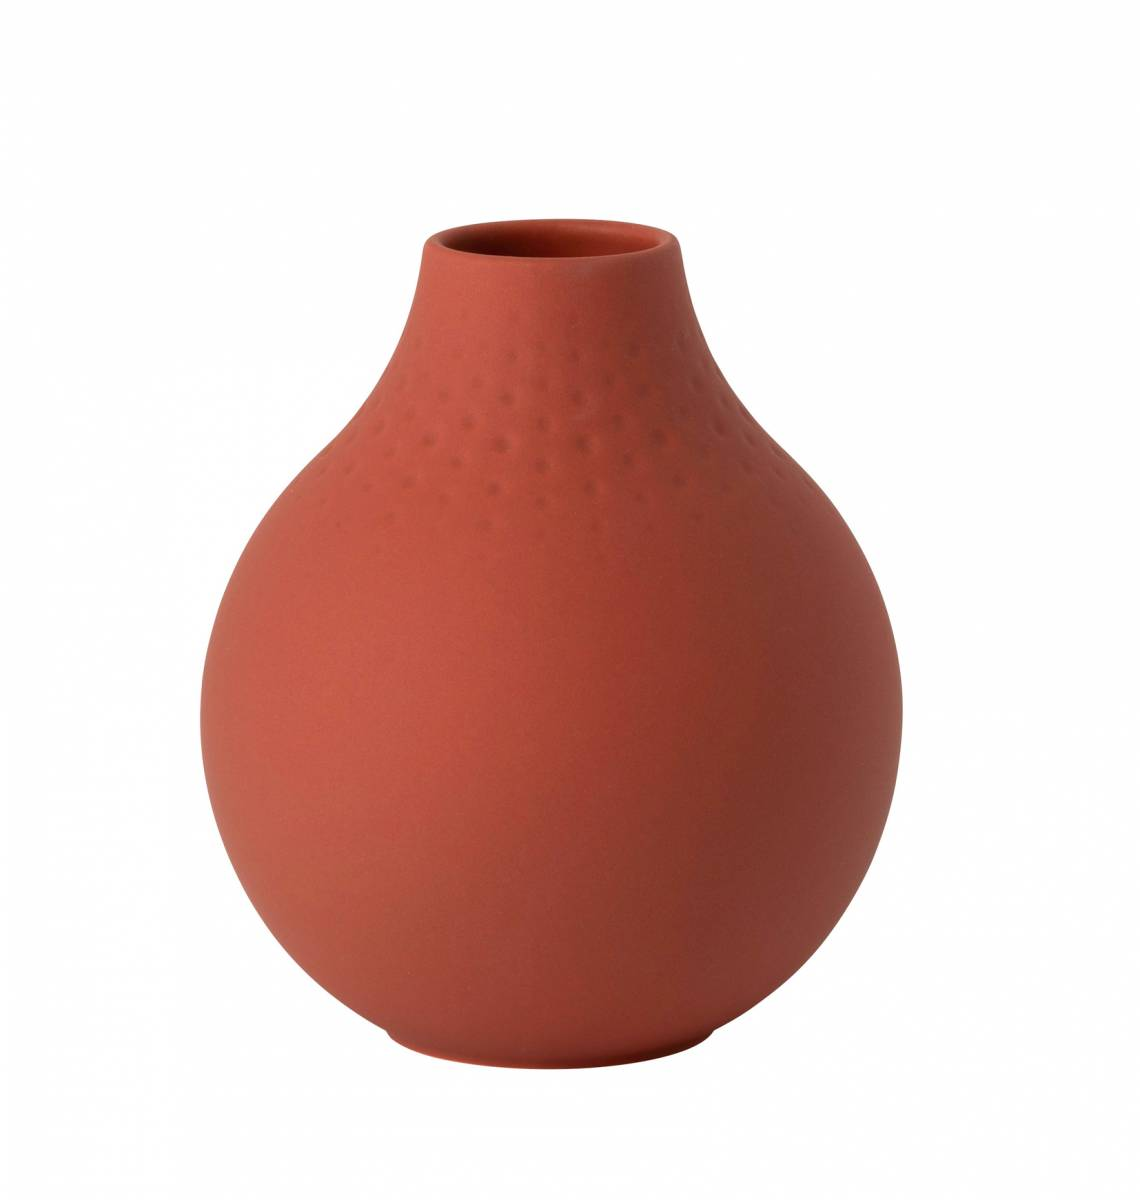 Villeroy & Boch: Manufacture Collier Vase rost 1016855516_A